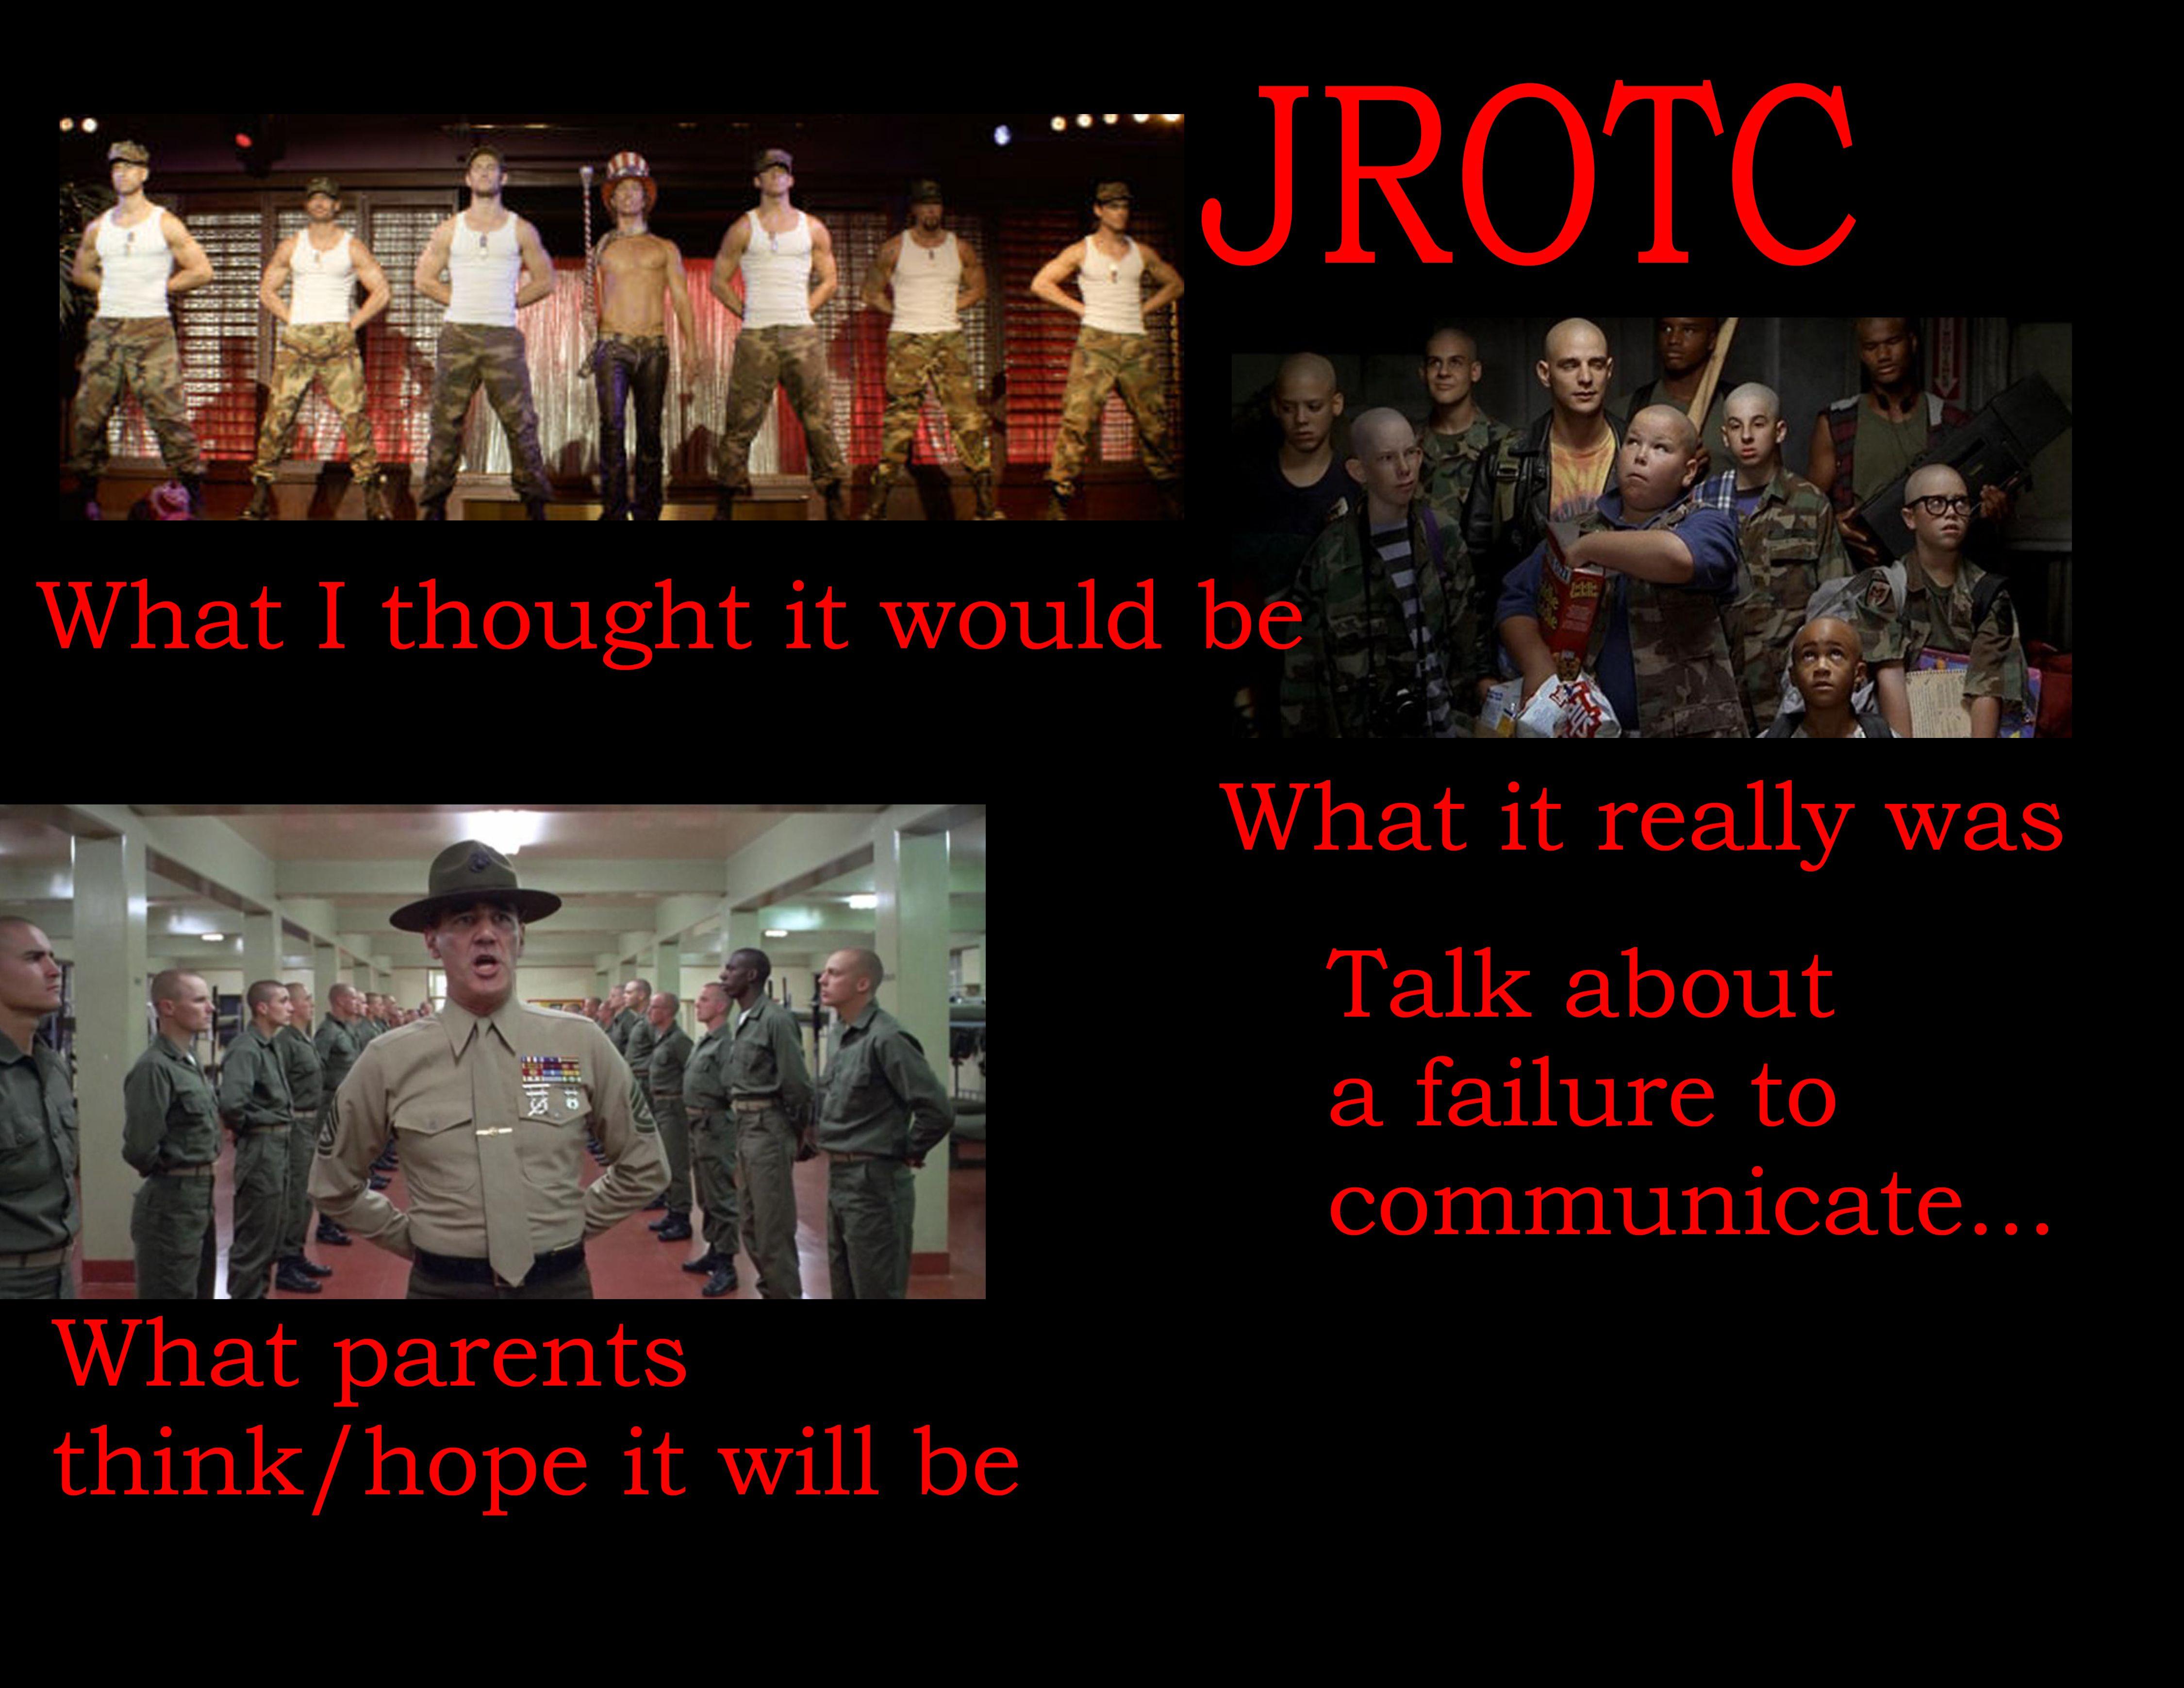 Not far from the truth... JROTC Pinterest Njrotc